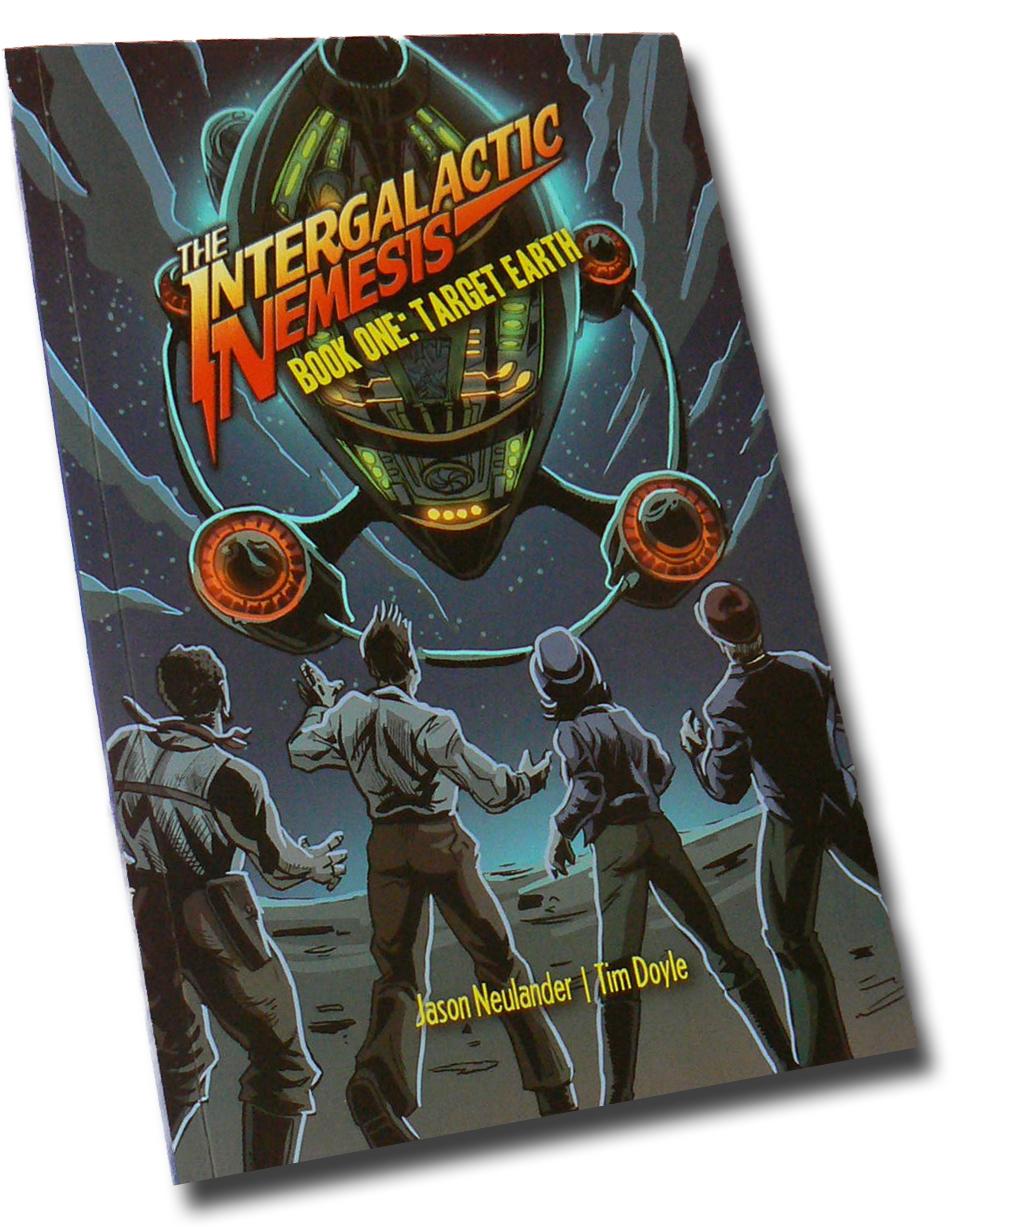 The Intergalactic Nemesis Graphic Novel /TPB now available!